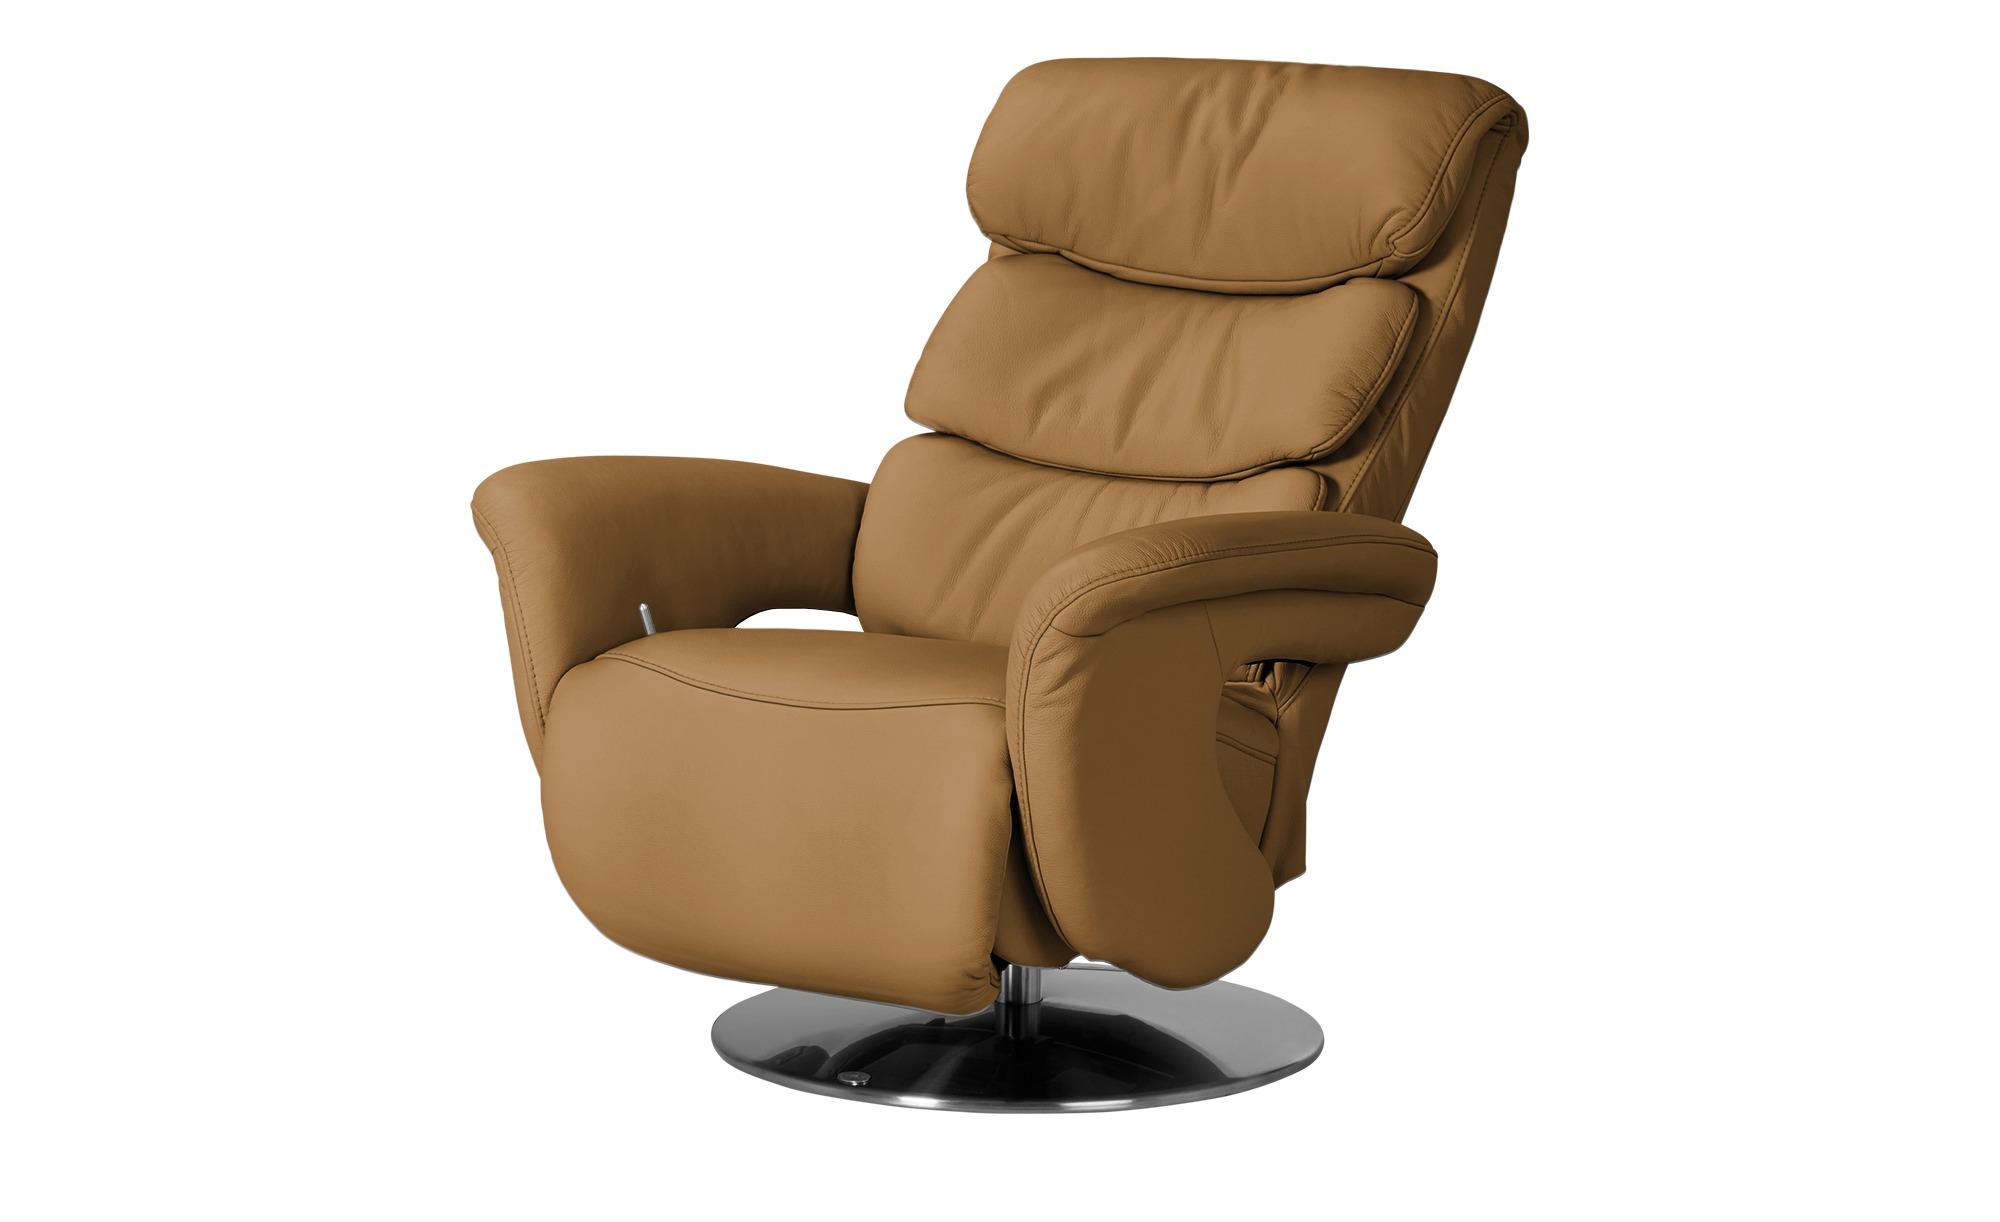 himolla Leder Relaxsessel  7228 - gelb - 83 cm - 109 cm - 90 cm - Polstermöbel > Sessel > Fernsehsessel - Möbel Kraft | Wohnzimmer > Sessel > Relaxsessel | himolla